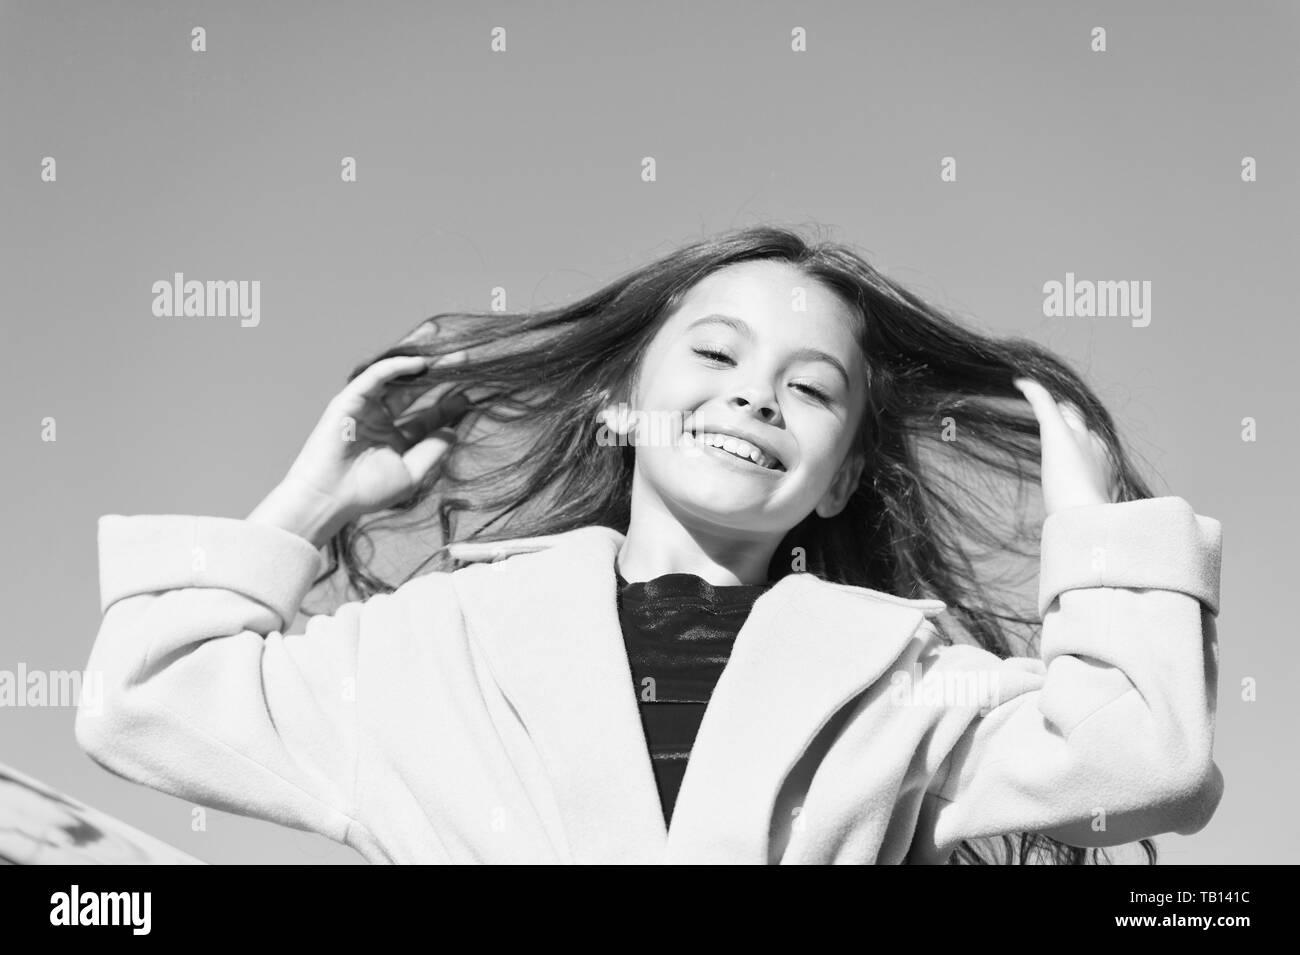 Happy day. Kid girl long hair enjoy walk sunny day blue sky background. Girl carefree childhood walk. Charming little stylish fashionable girl. Feeling free and happy. Little child enjoy sunny walk. Stock Photo